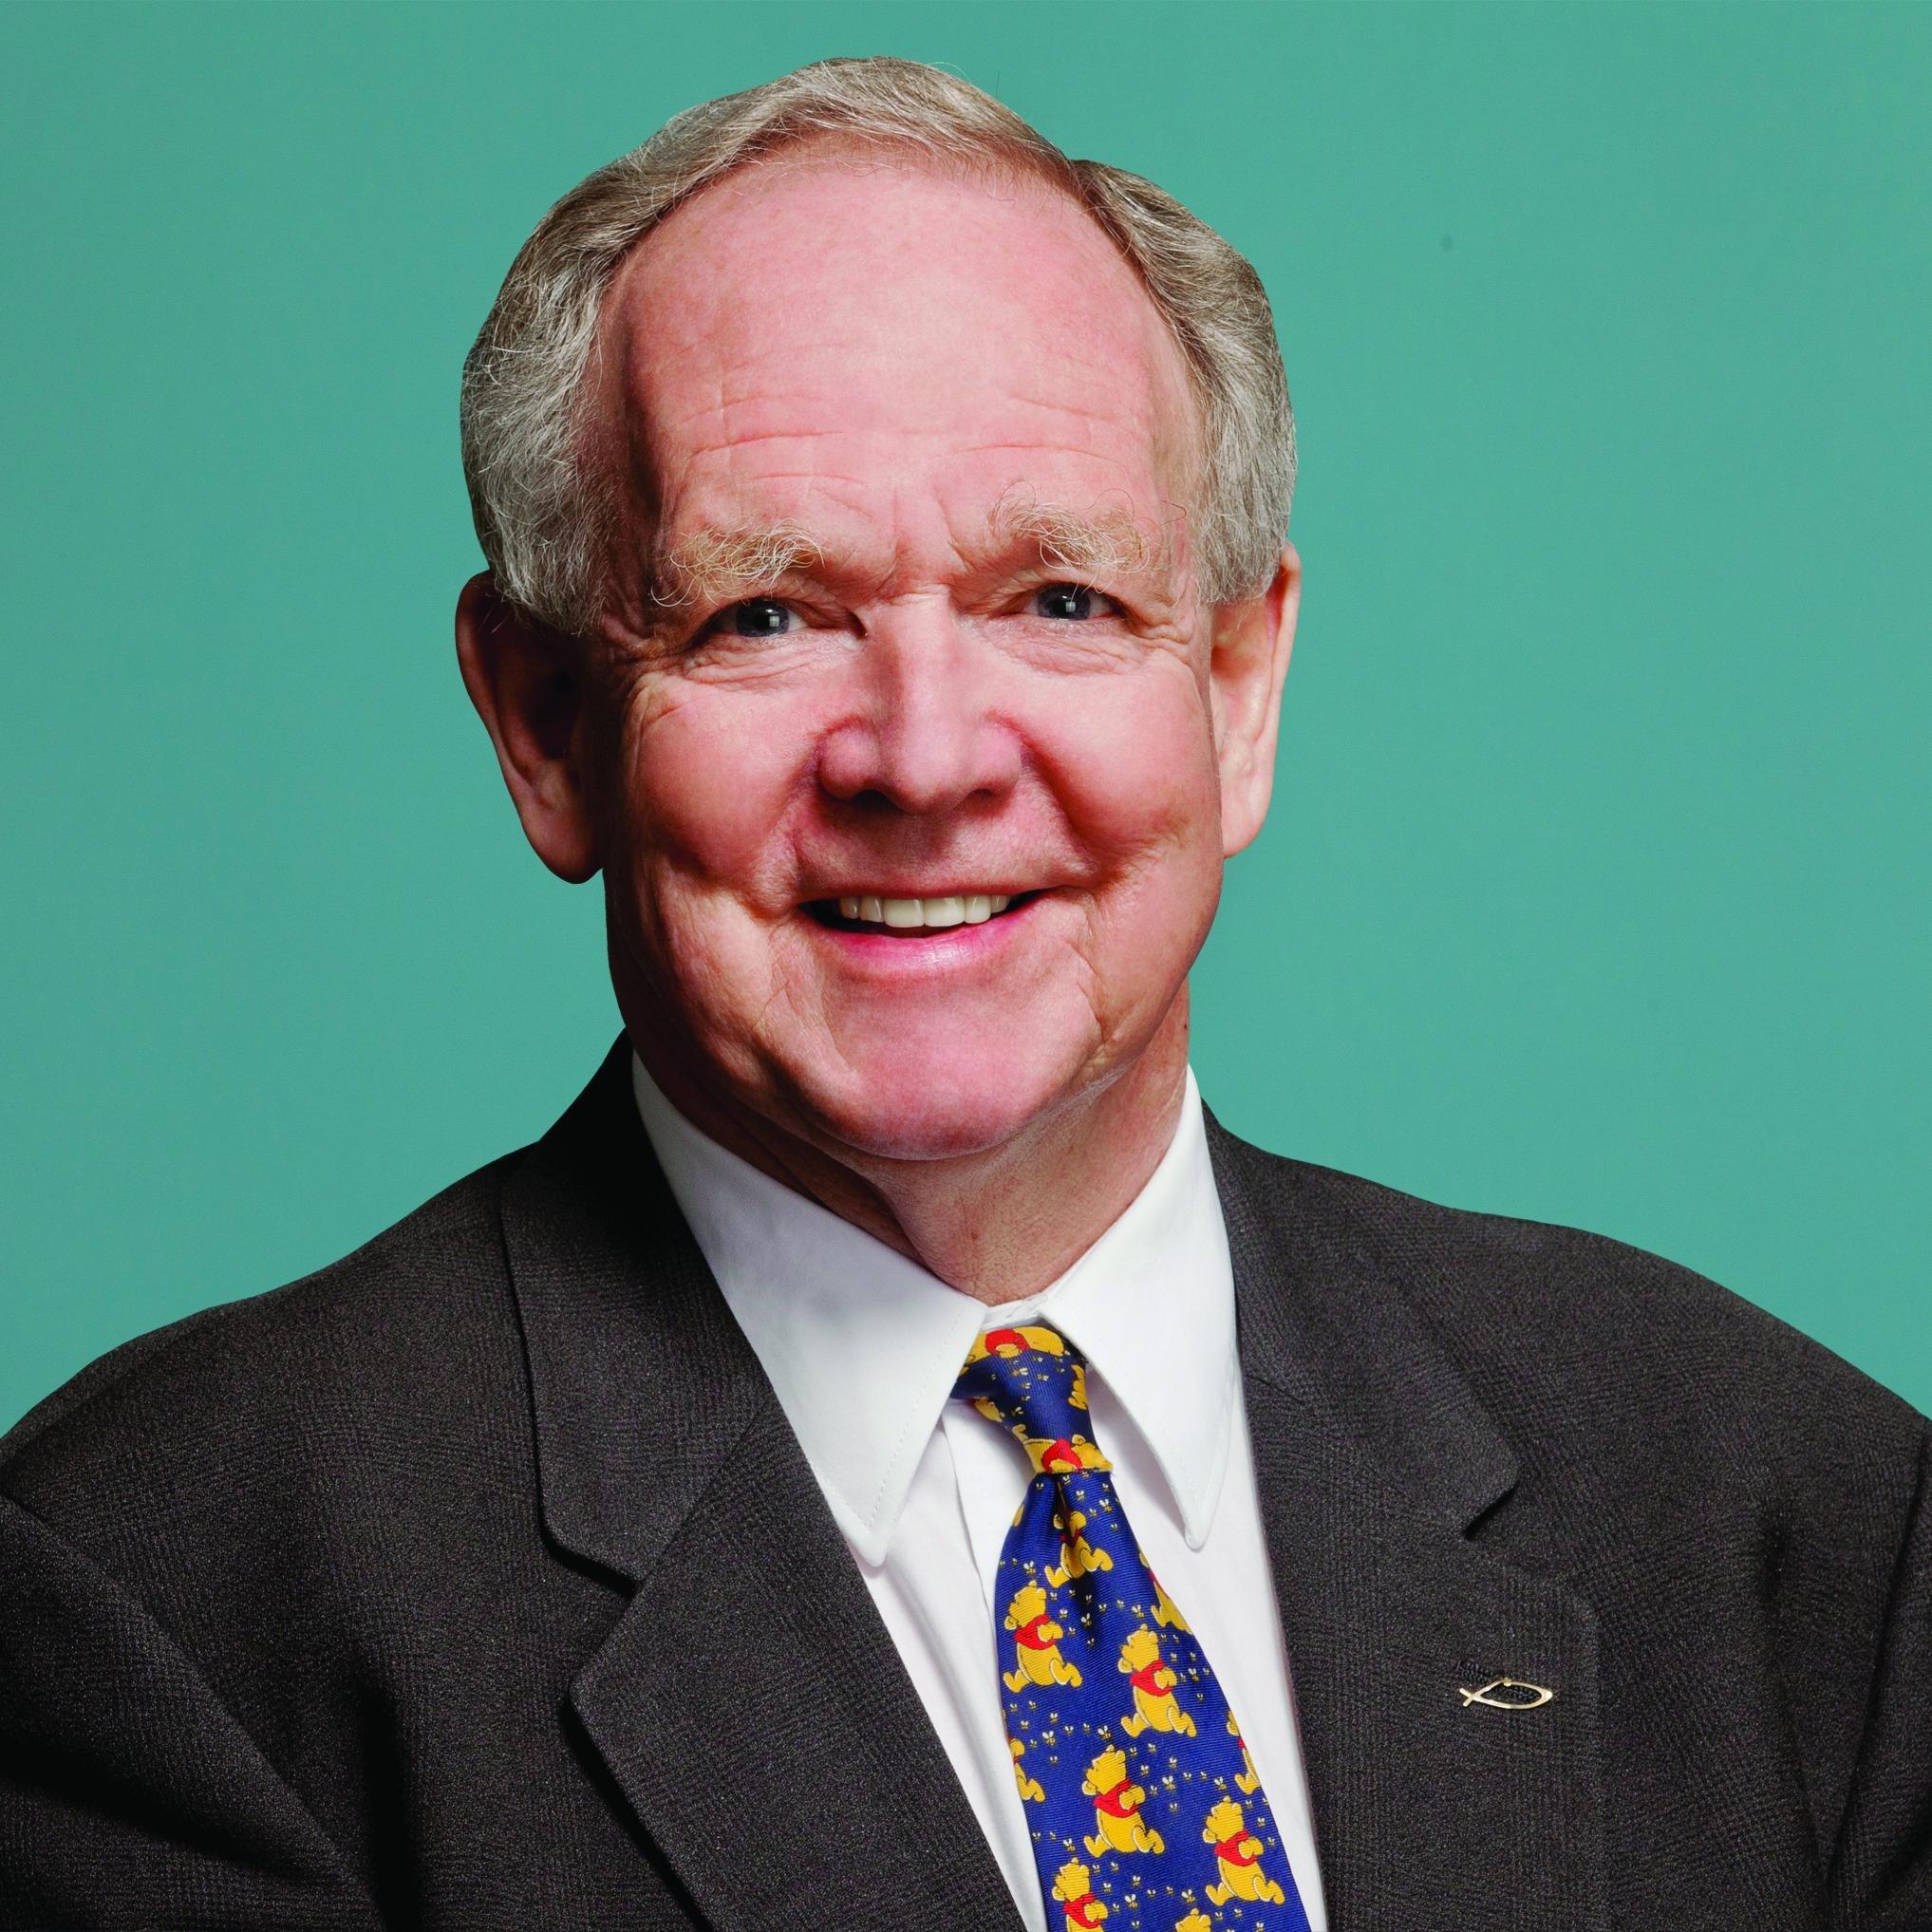 Bob Hilliard